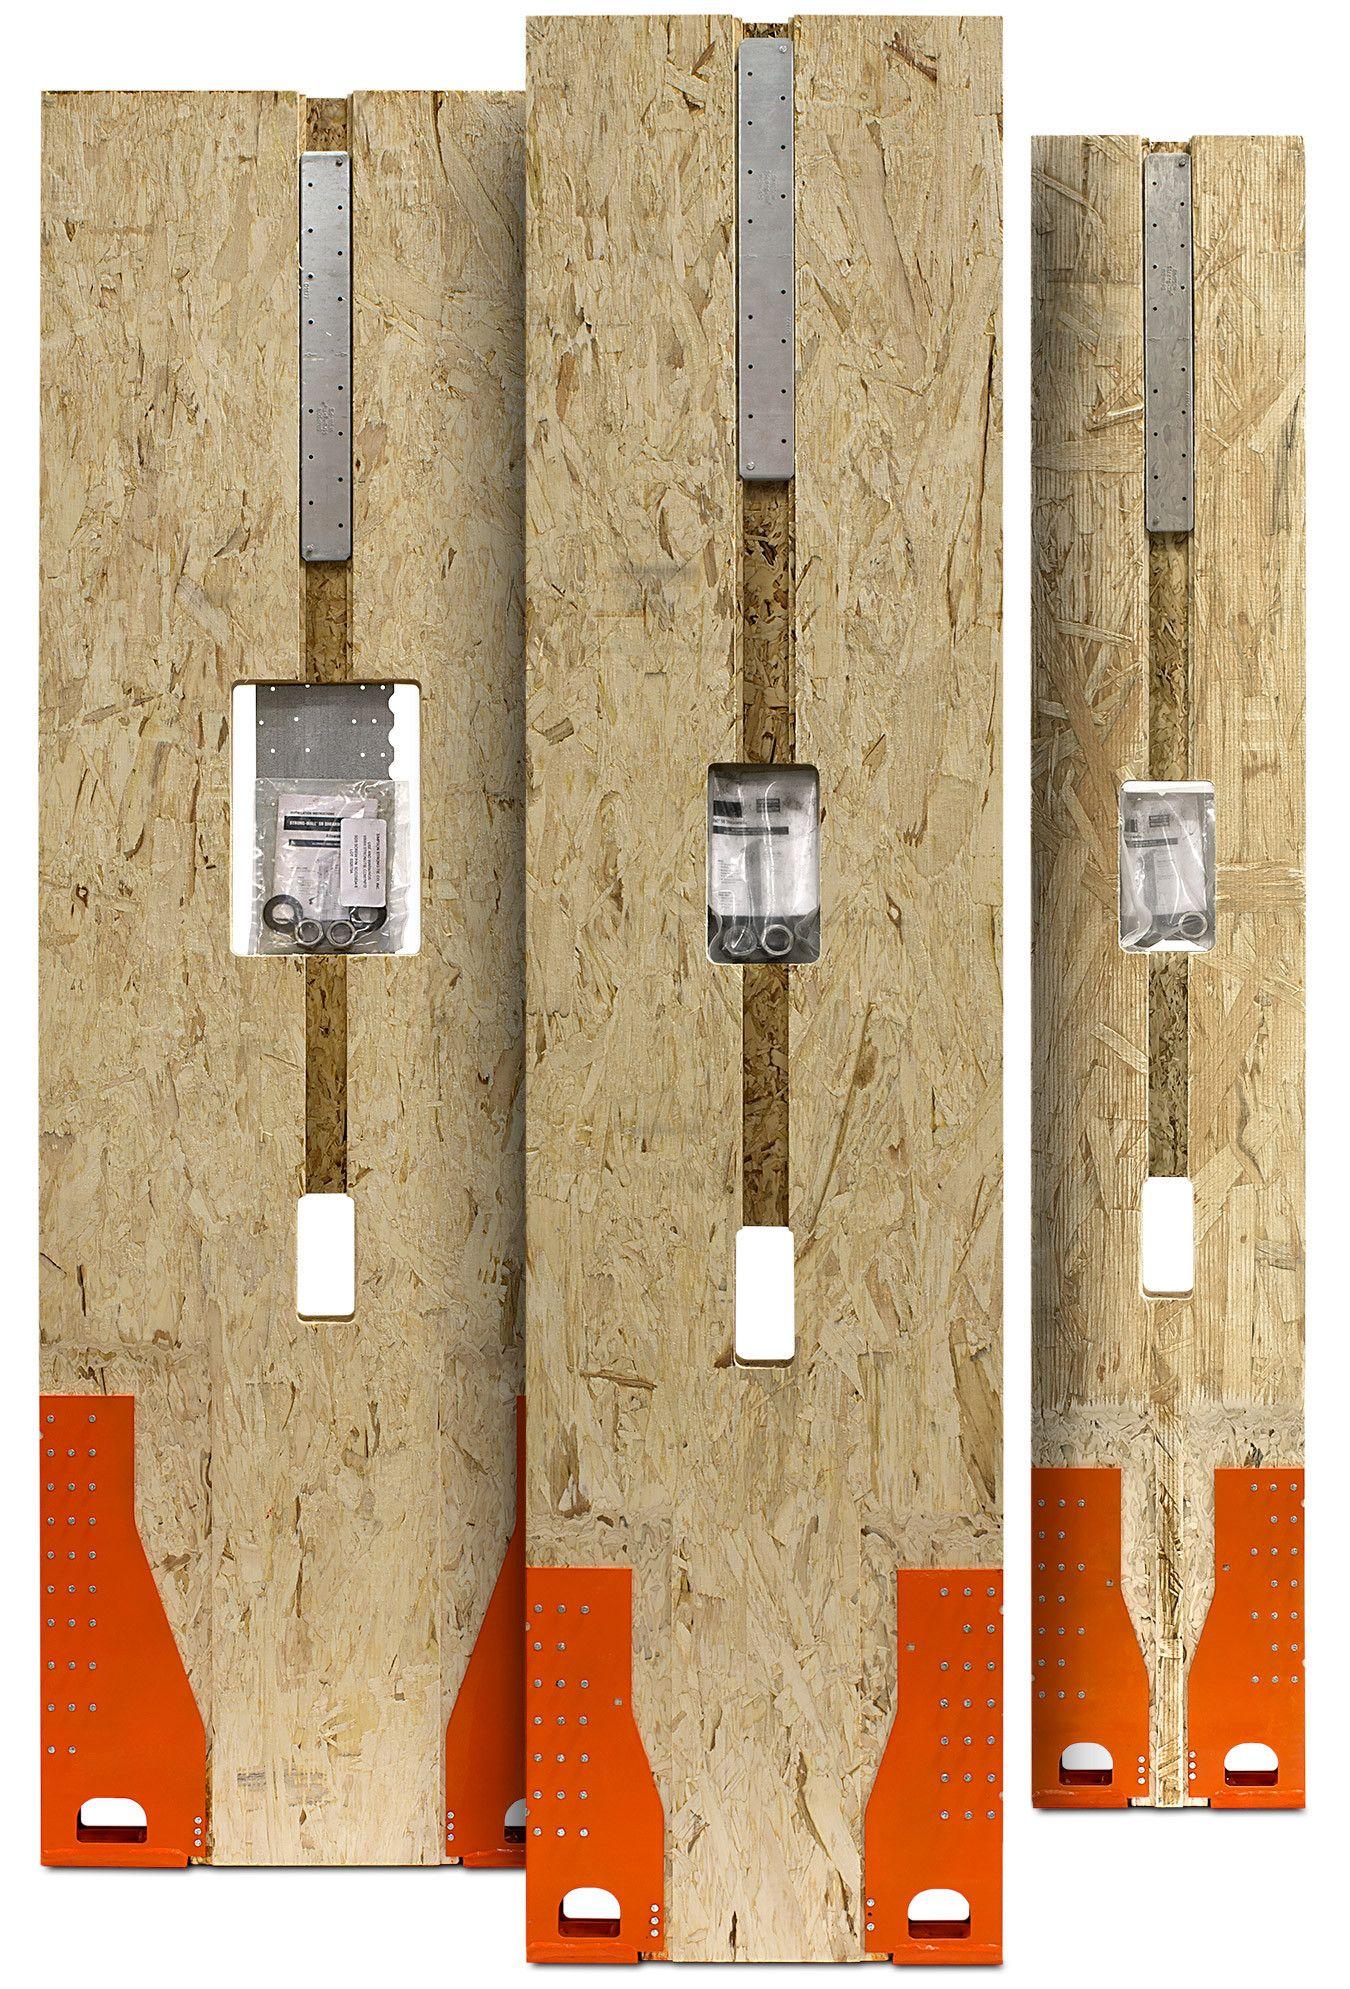 Wood Shearwalls Product Kit Back - WSW-back-3walls-kit